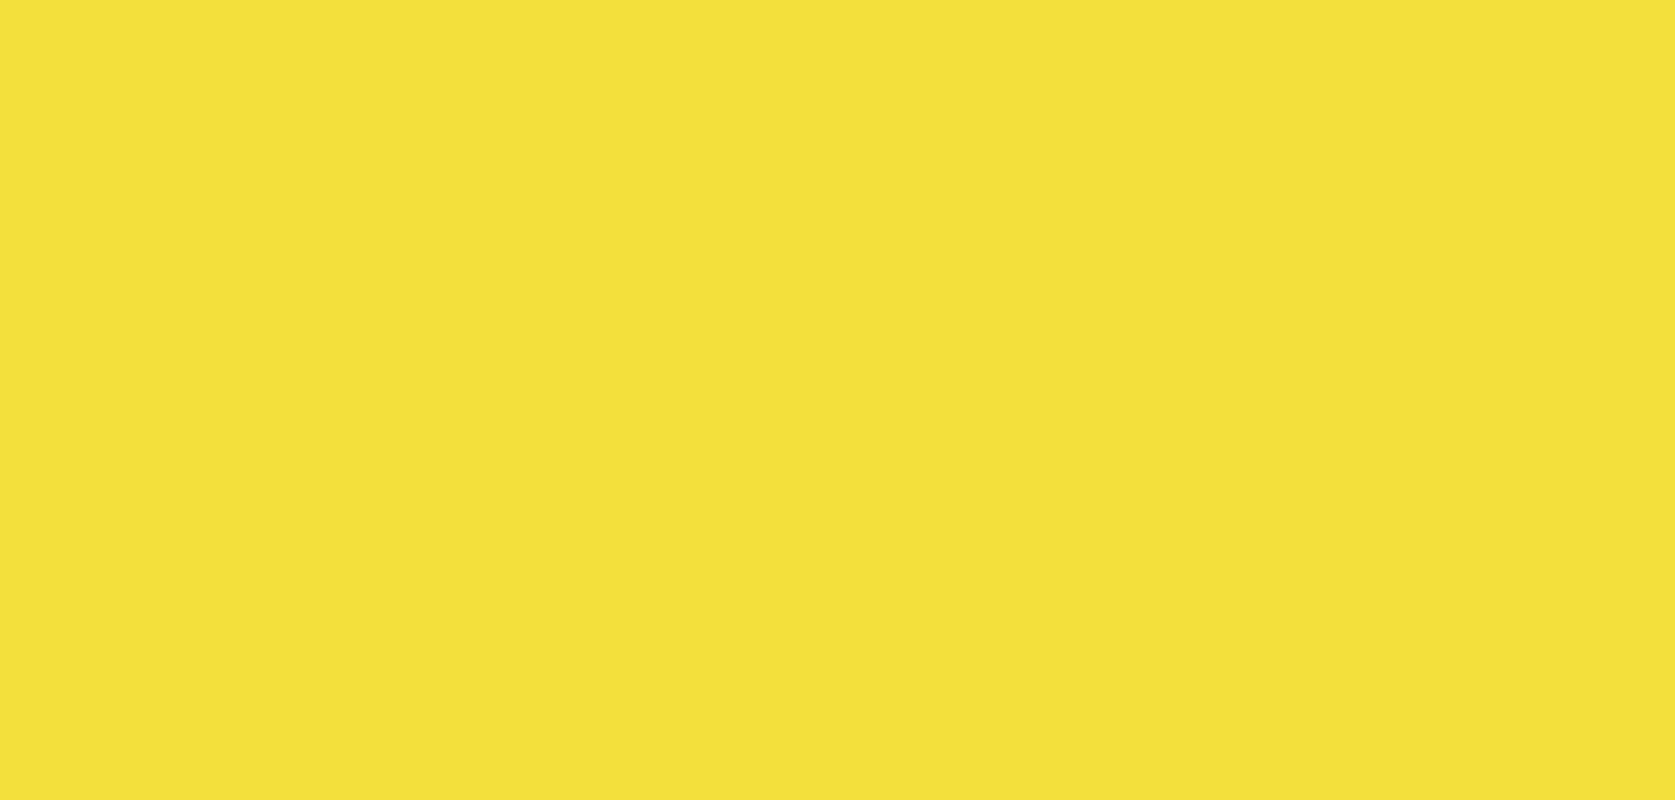 МЕТАЛЛОЧЕРЕПИЦА Стандарт полиэстер одностороннее 0,45 мм цвет 1018, 2004, 3020, 4005, 4006, 8004.